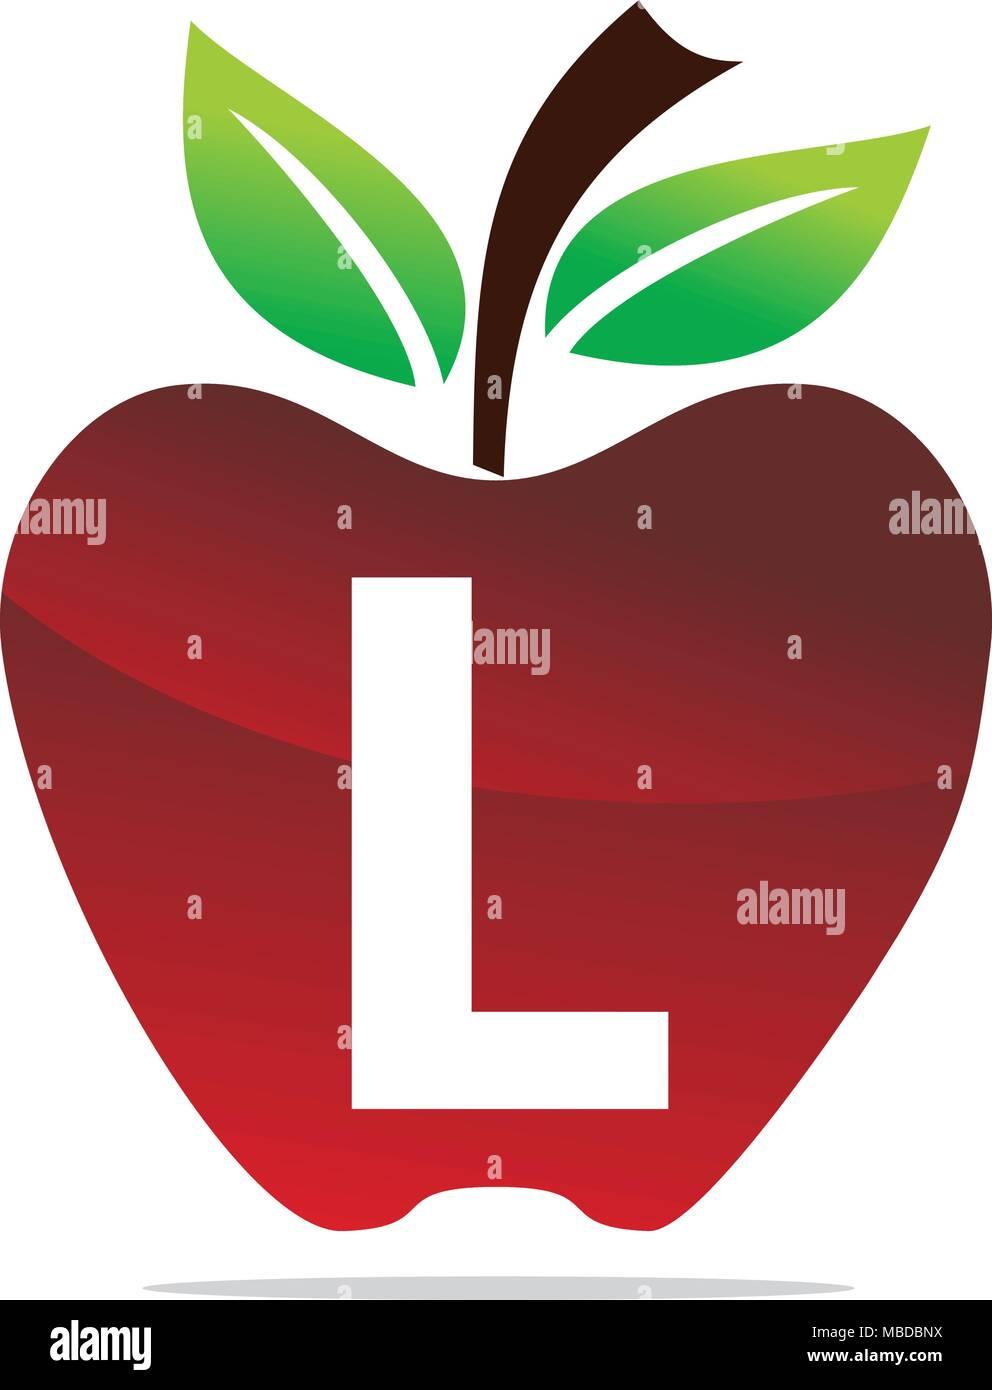 apple letter l logo design template vector